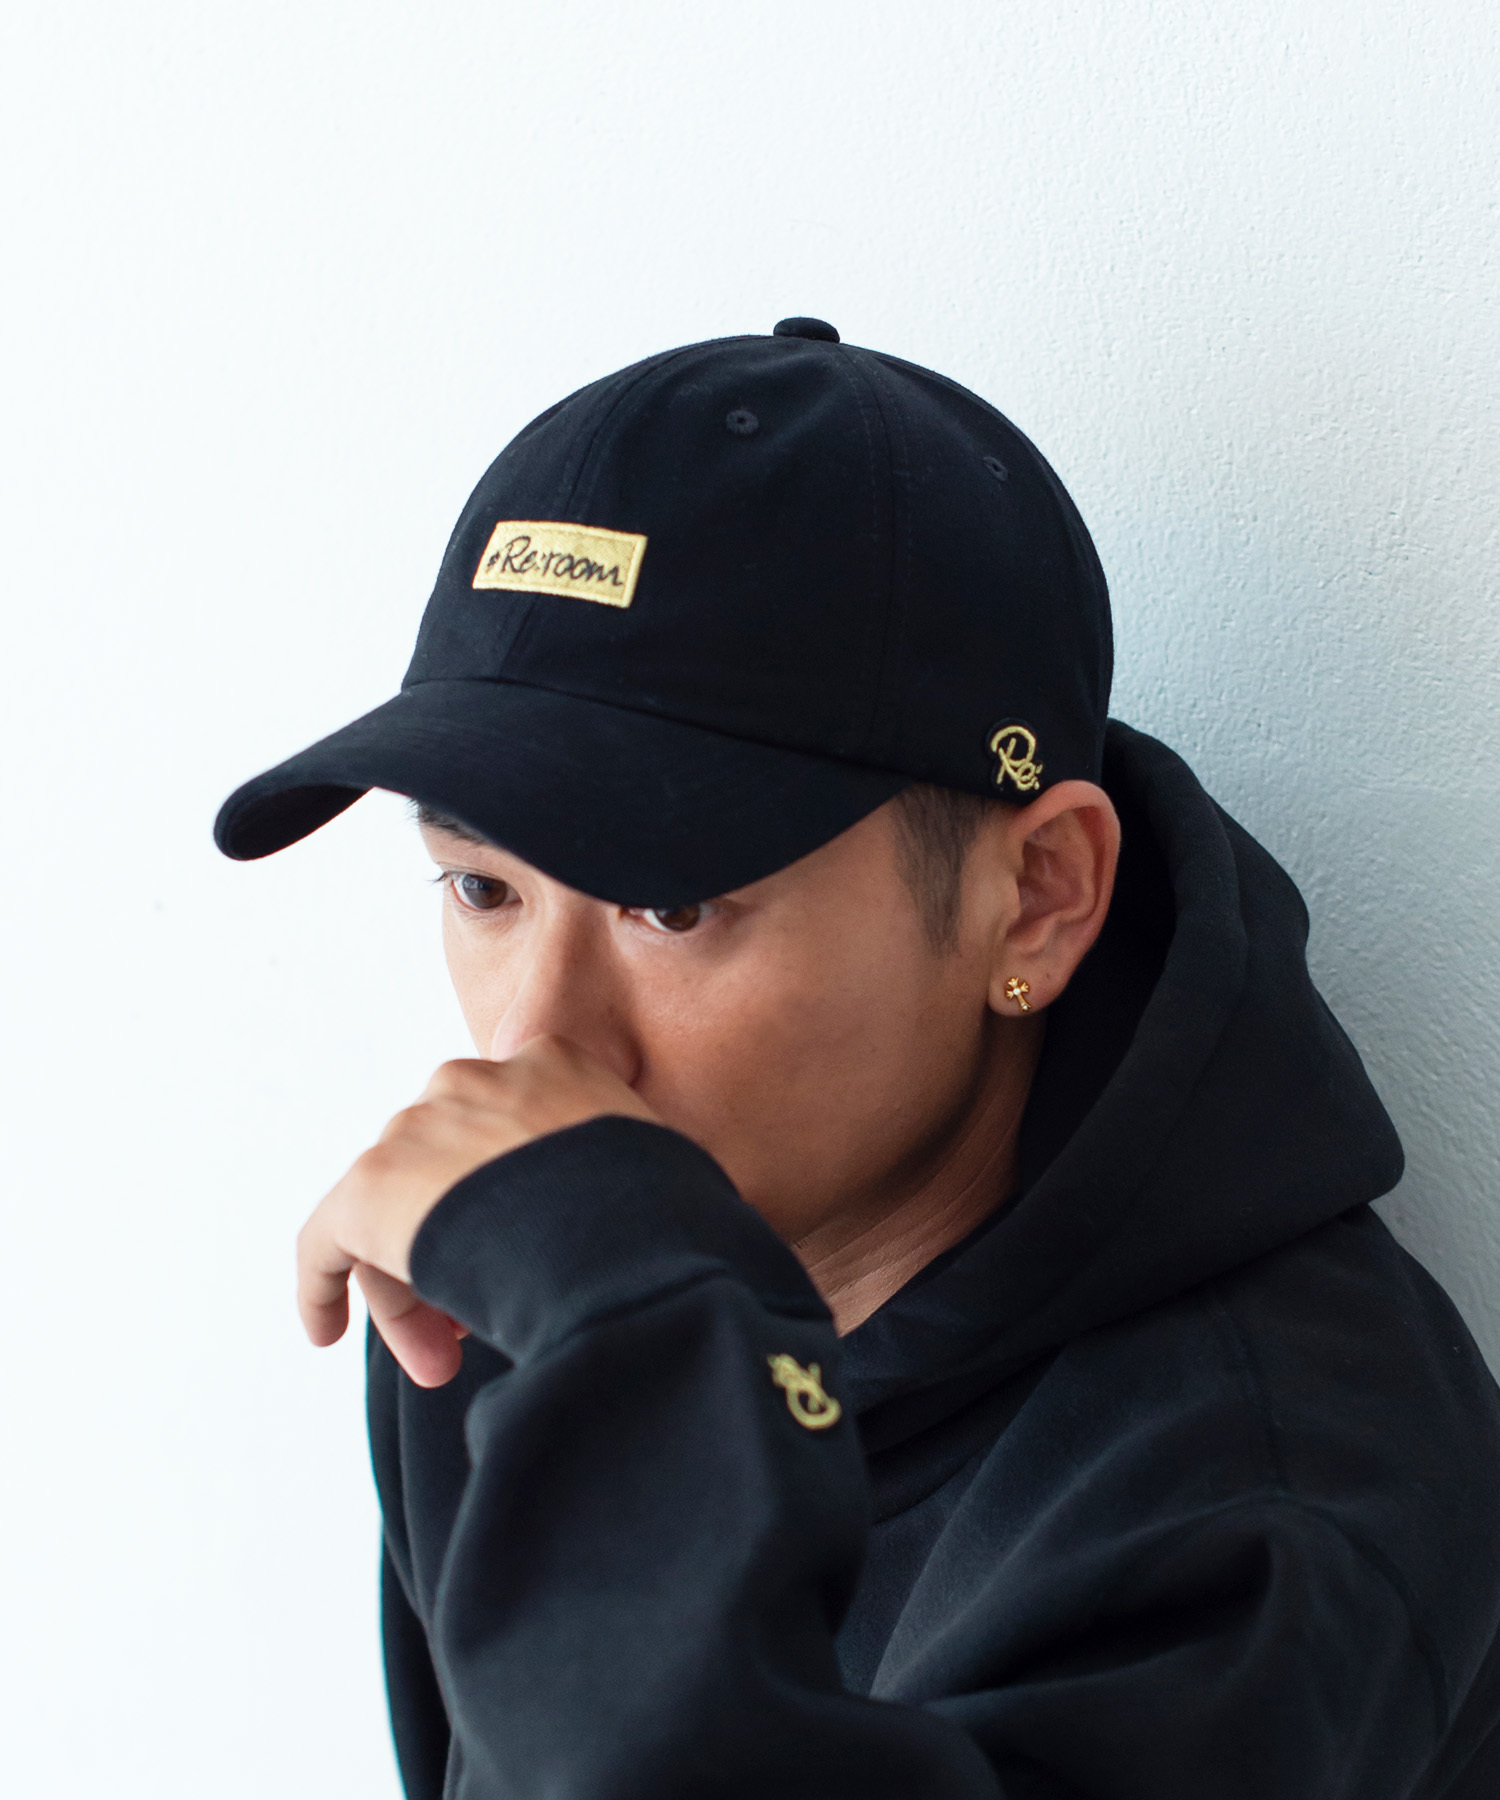 3rd ANNIVERSARY LIMITED LOGO CAP[REH071]